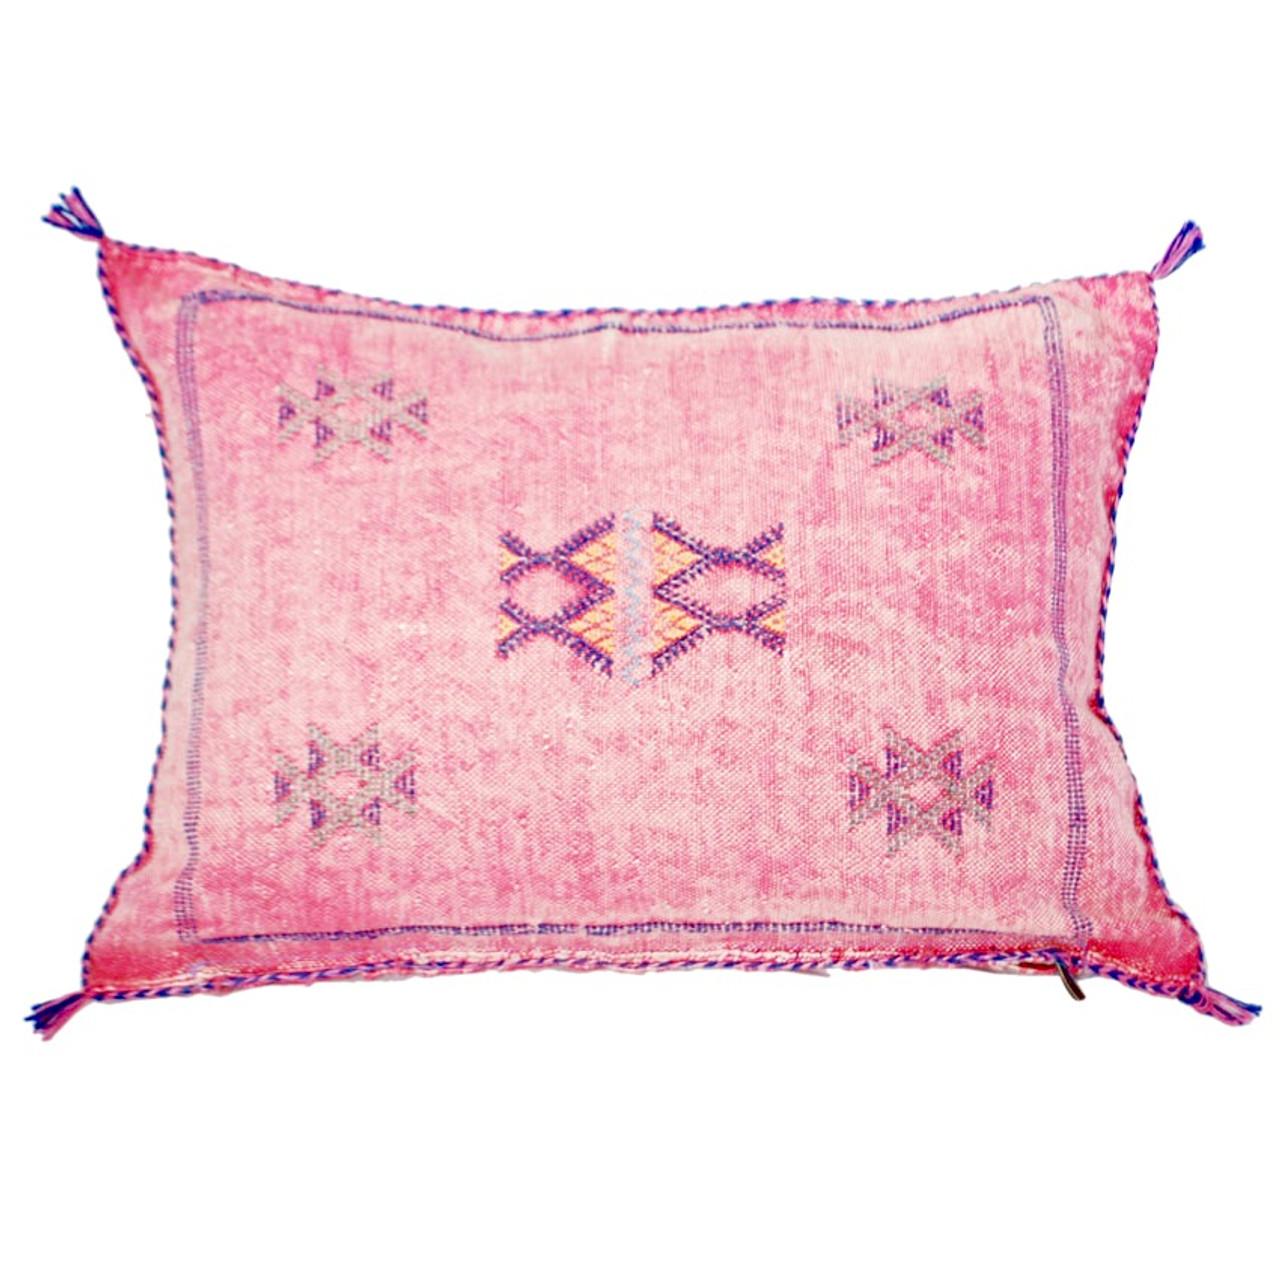 Moroccan Sabra Throw Pillows Dusty Pink Pillow Sheherazade Home